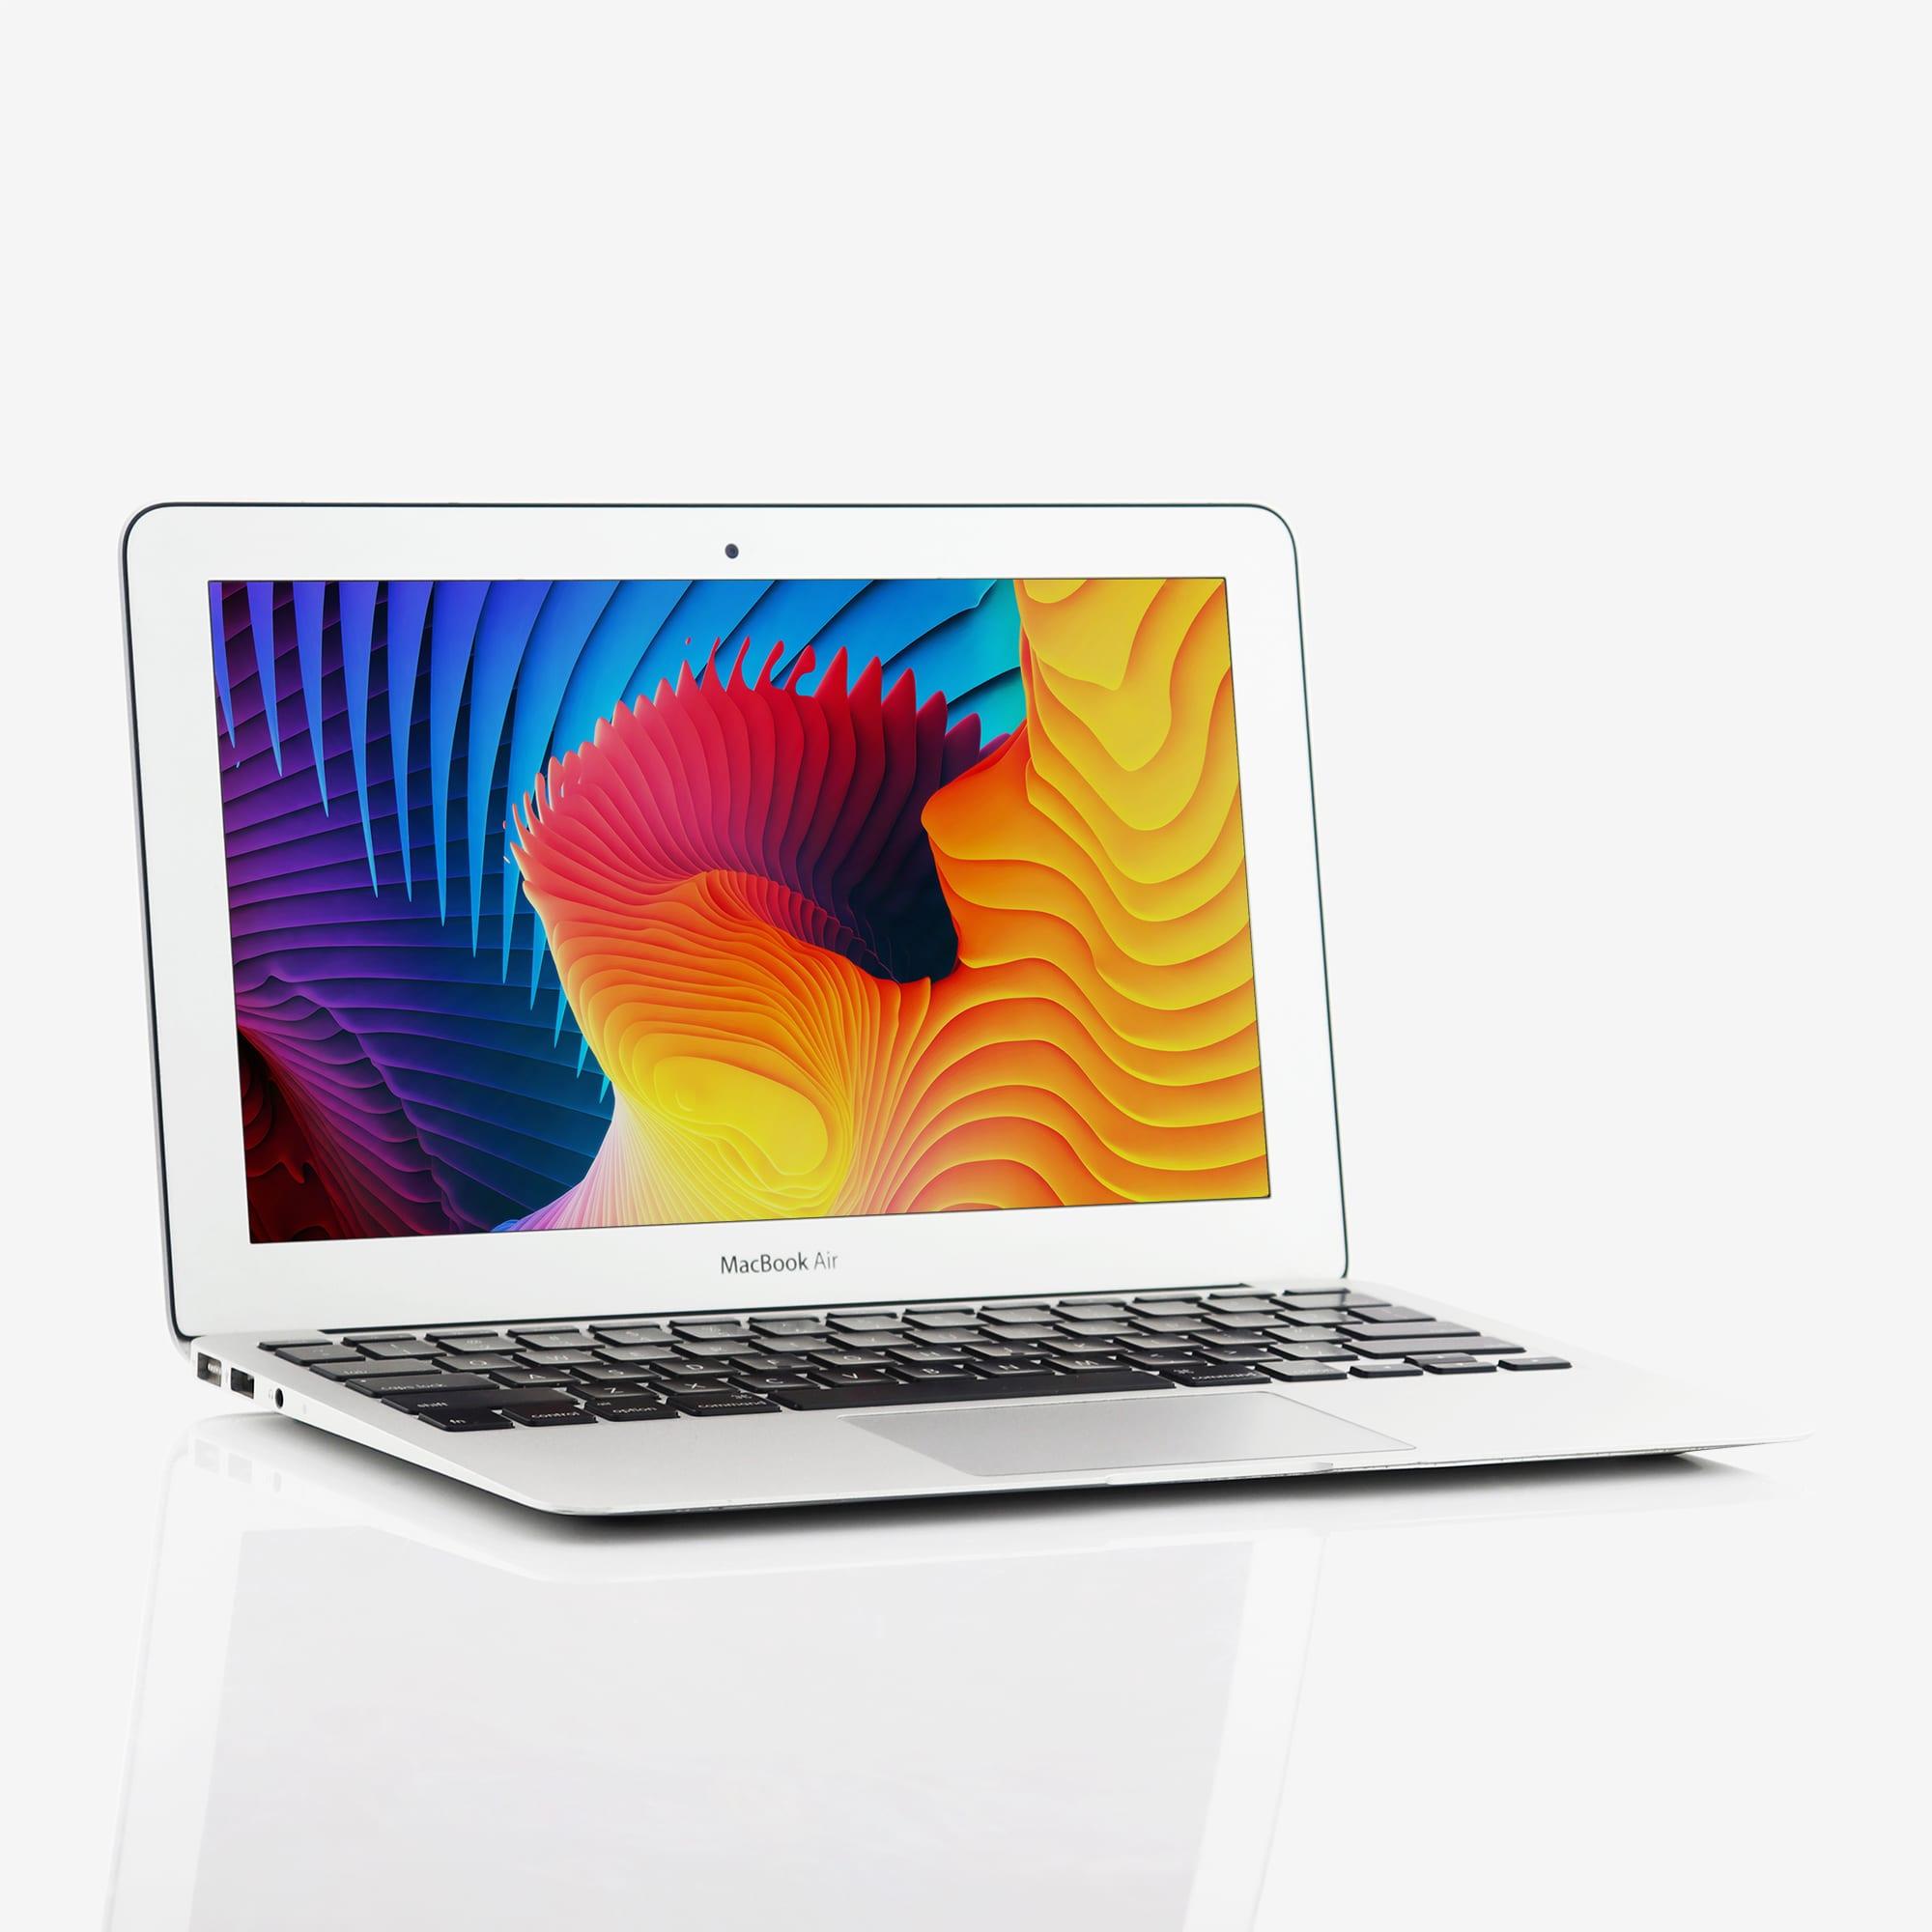 1 x Apple MacBook Air 11 Inch Intel Core i5 1.30 GHz (2013)